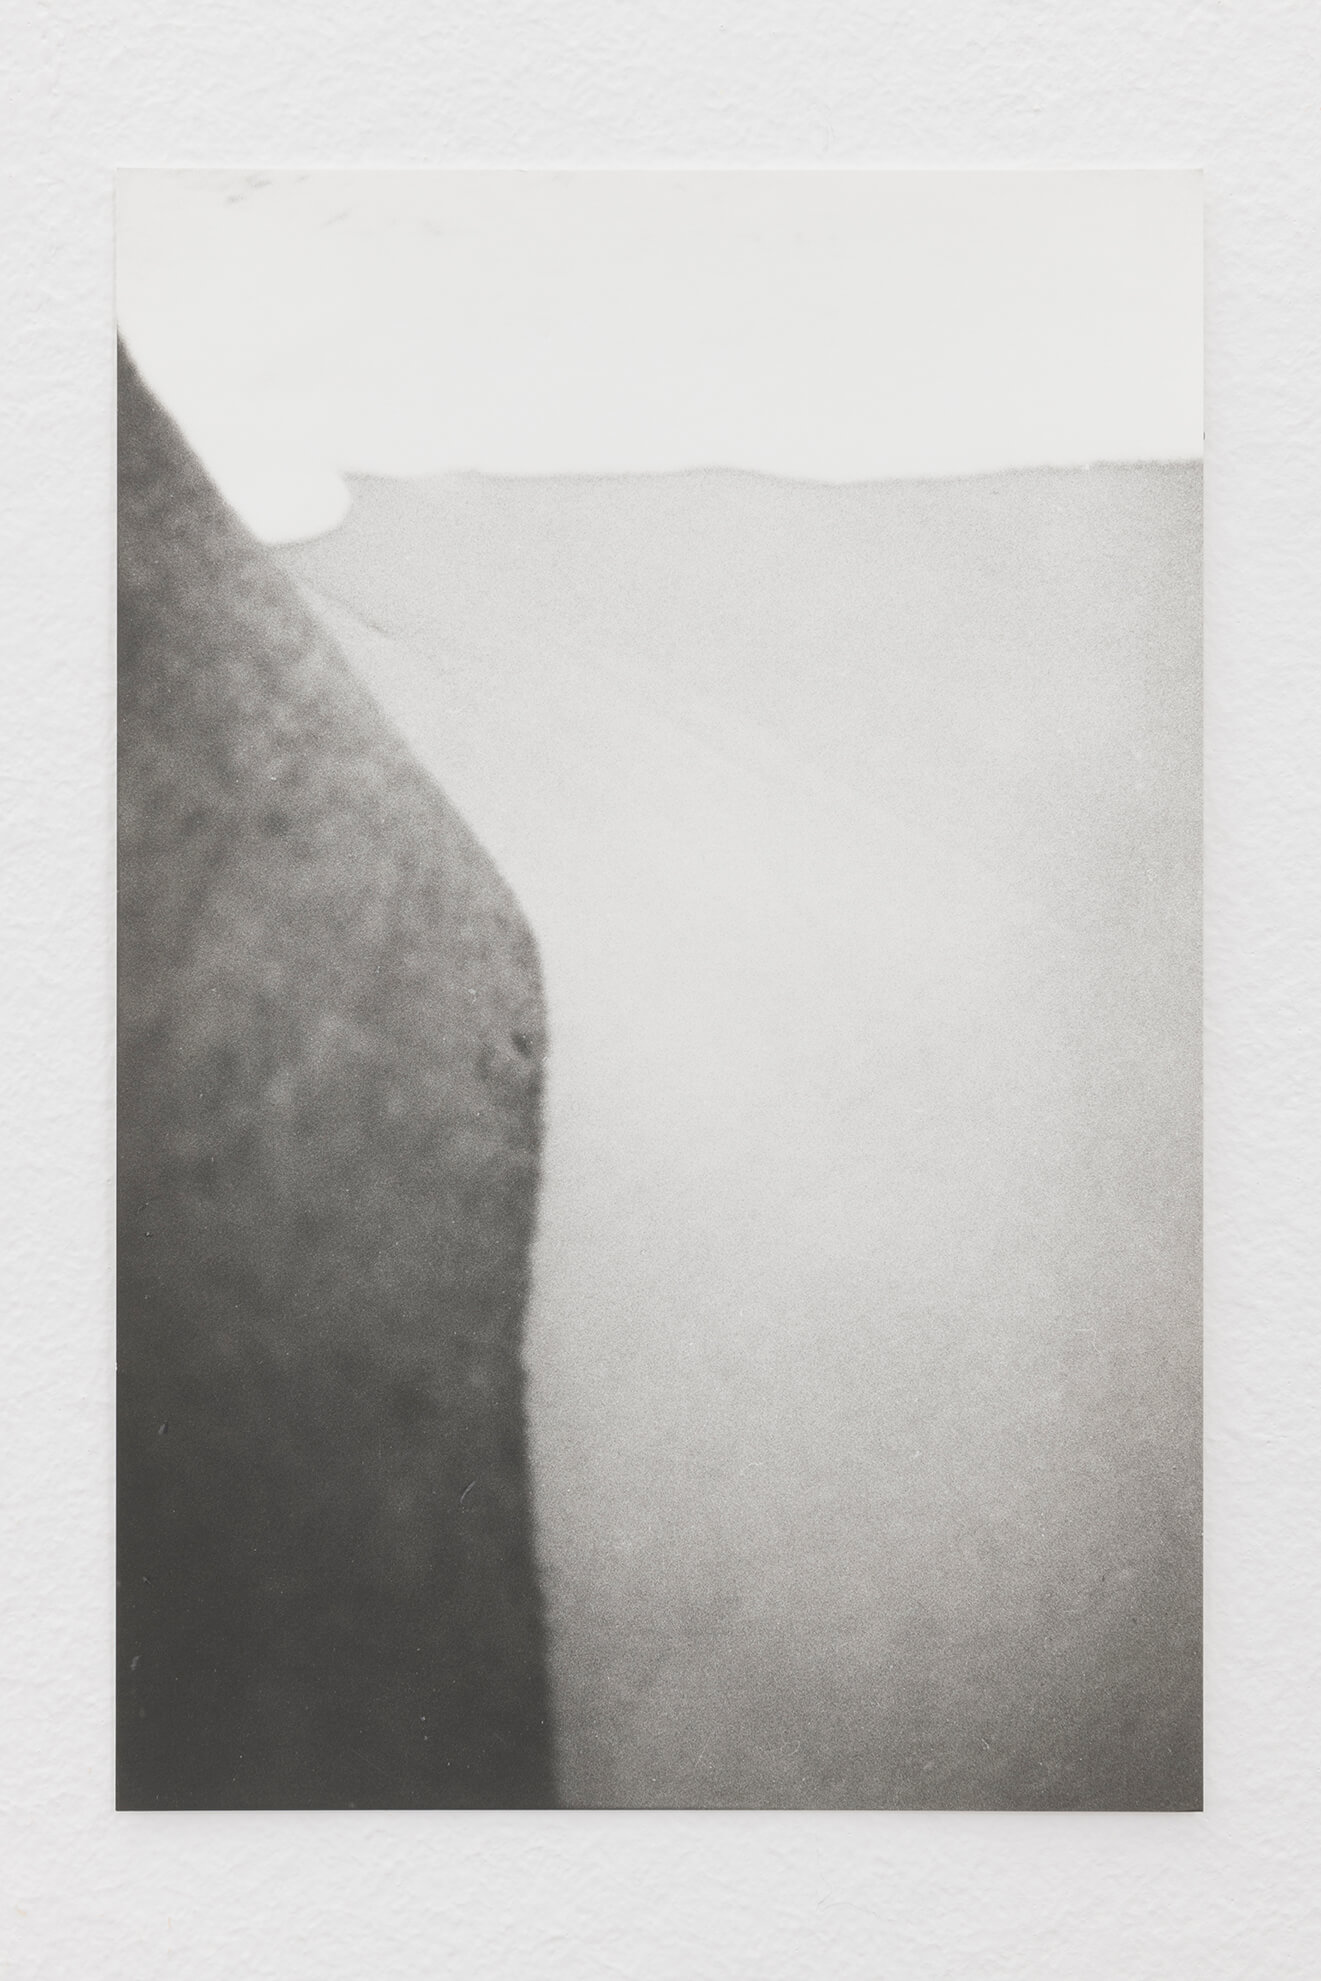 JOCHEN LEMPERT. Untitled (Atlantic Ocean), 2019. (Detail) | El Museu Imaginari / El Museo Imaginario / The Imaginary Museum | ProjecteSD